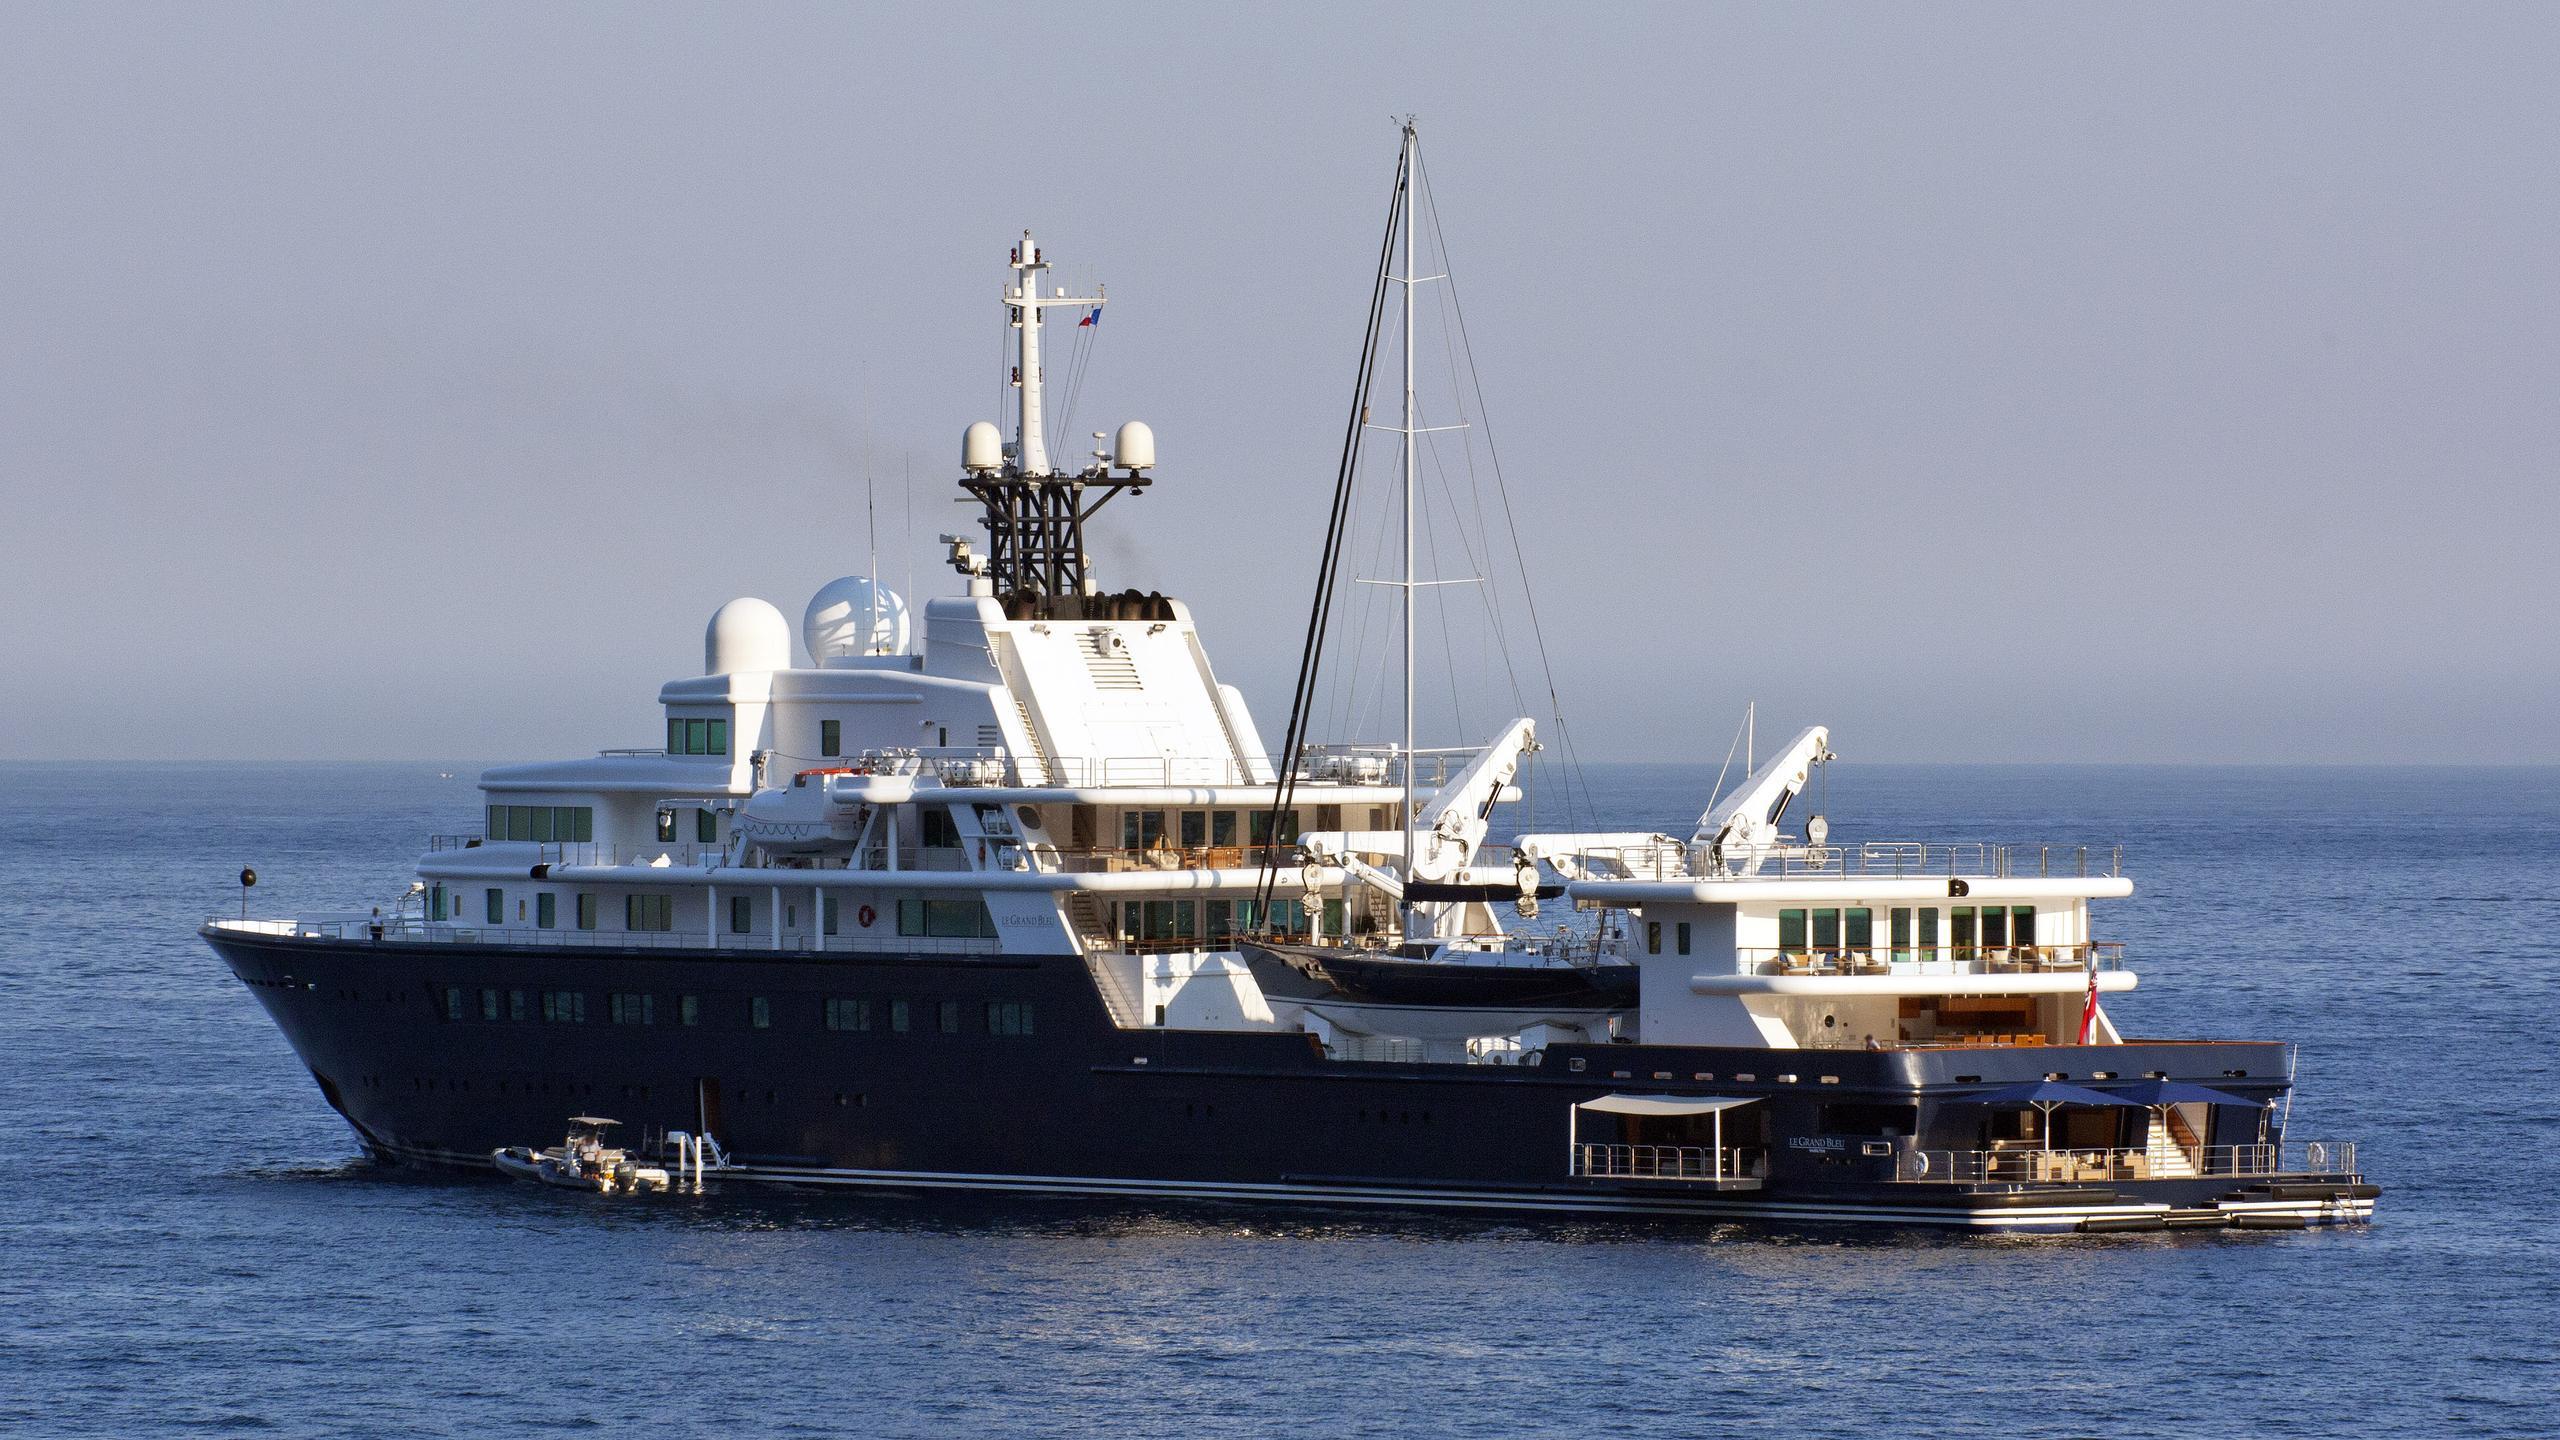 le-grand-bleu-explorer-yacht-bremer-vulkan-2000-113m-half-profile